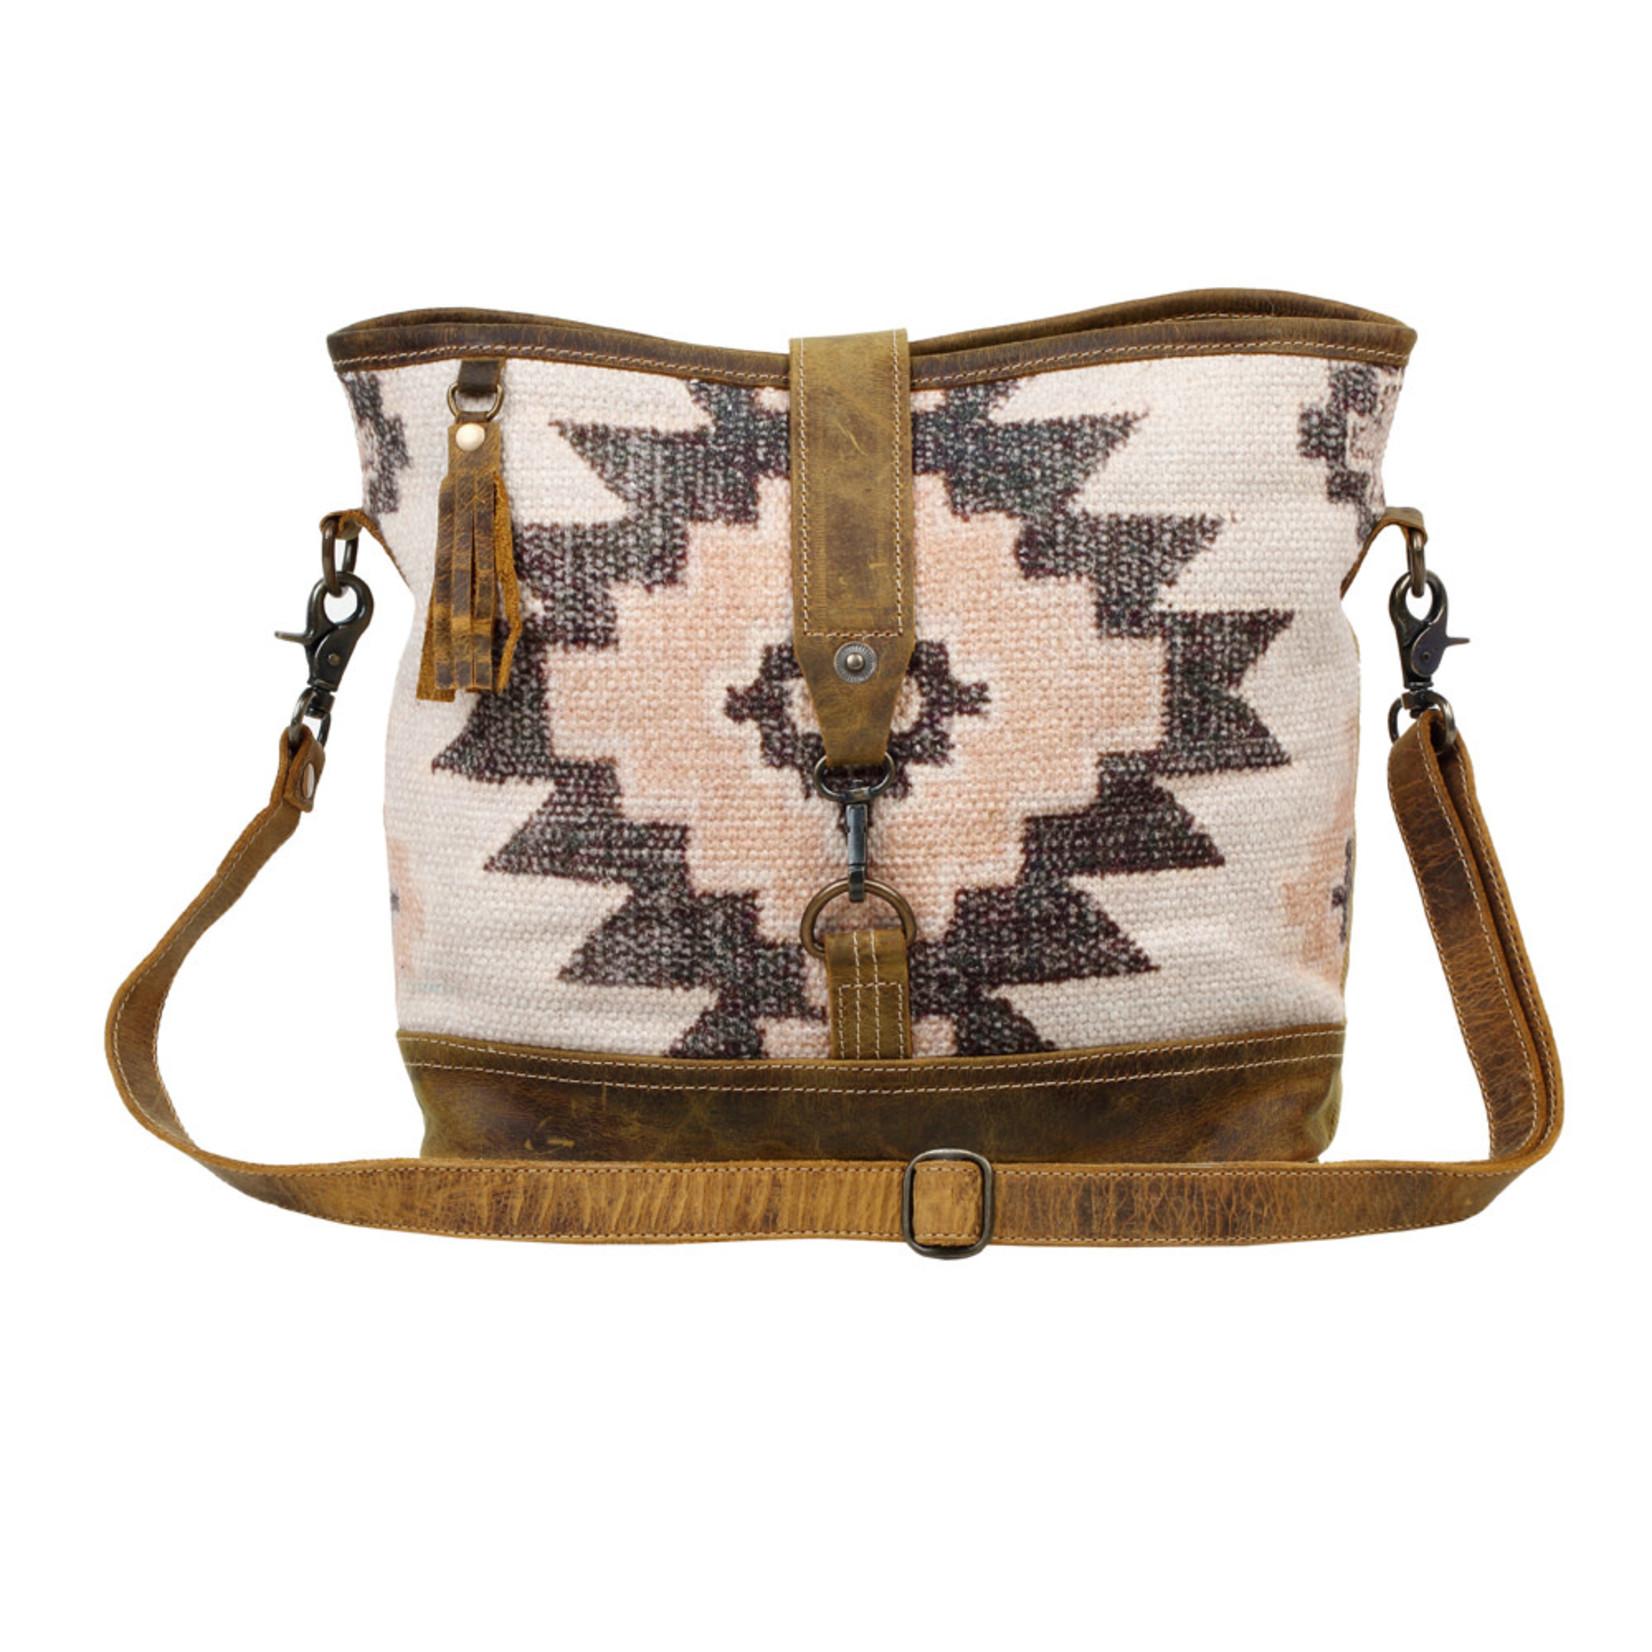 Myra Bags S-2642 Entice Shoulder Bag